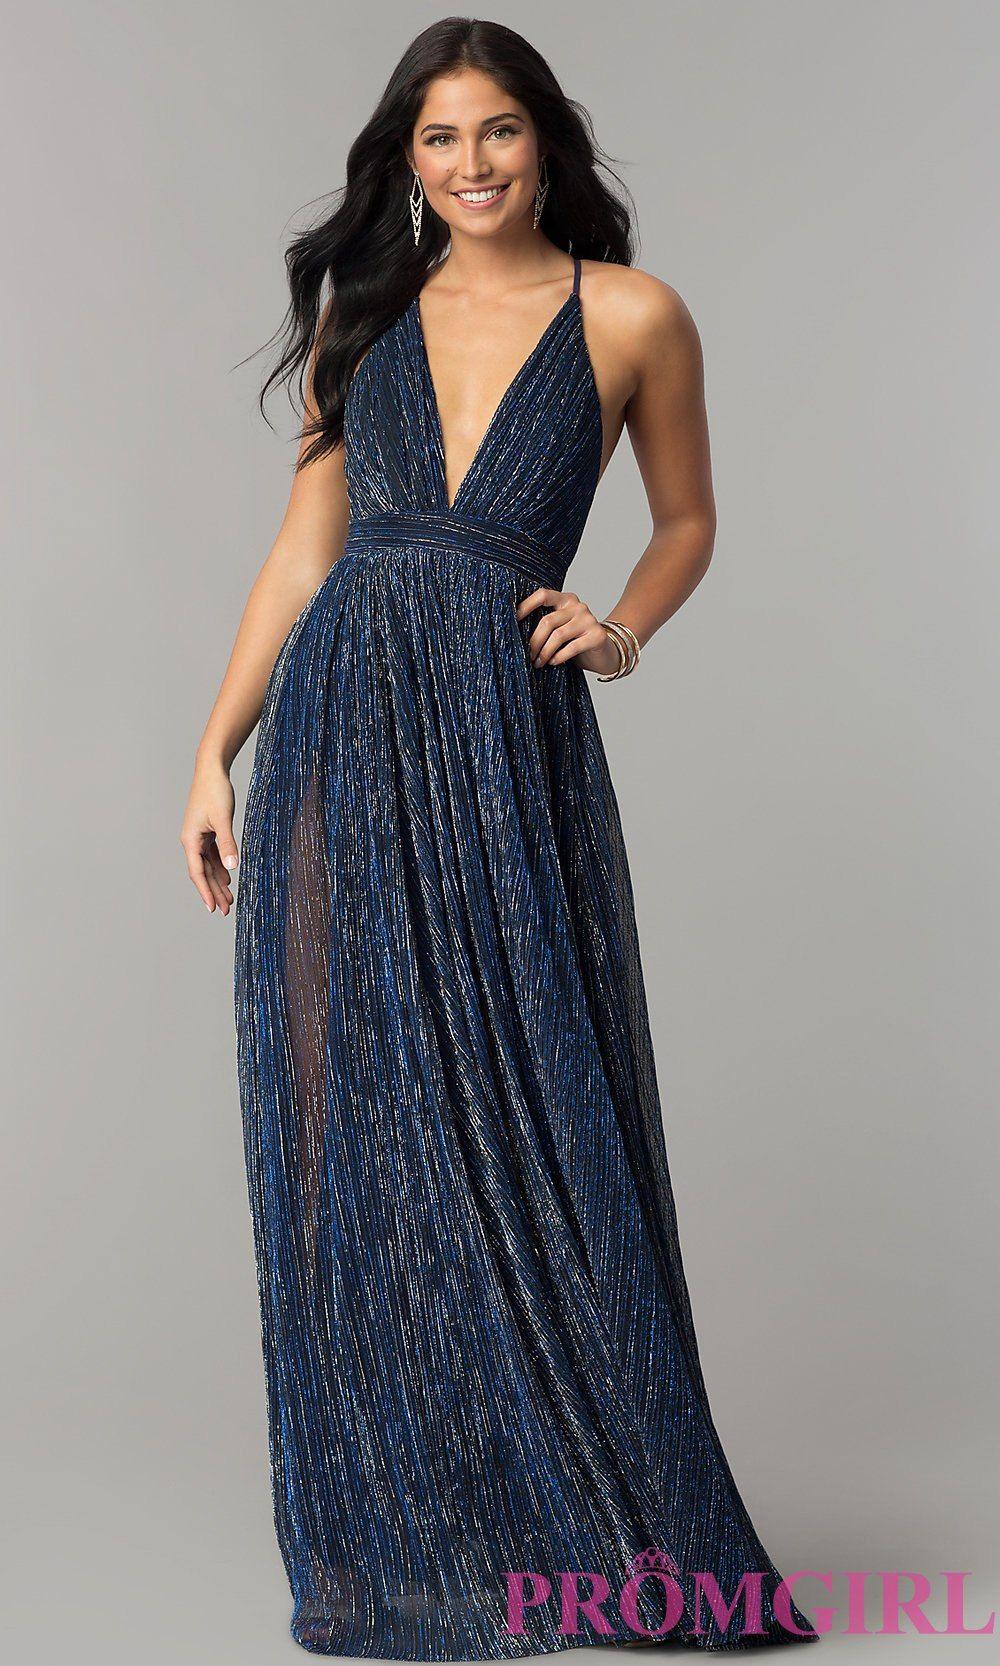 72aabcd06fe Homecoming Dresses Like Lulus - Gomes Weine AG